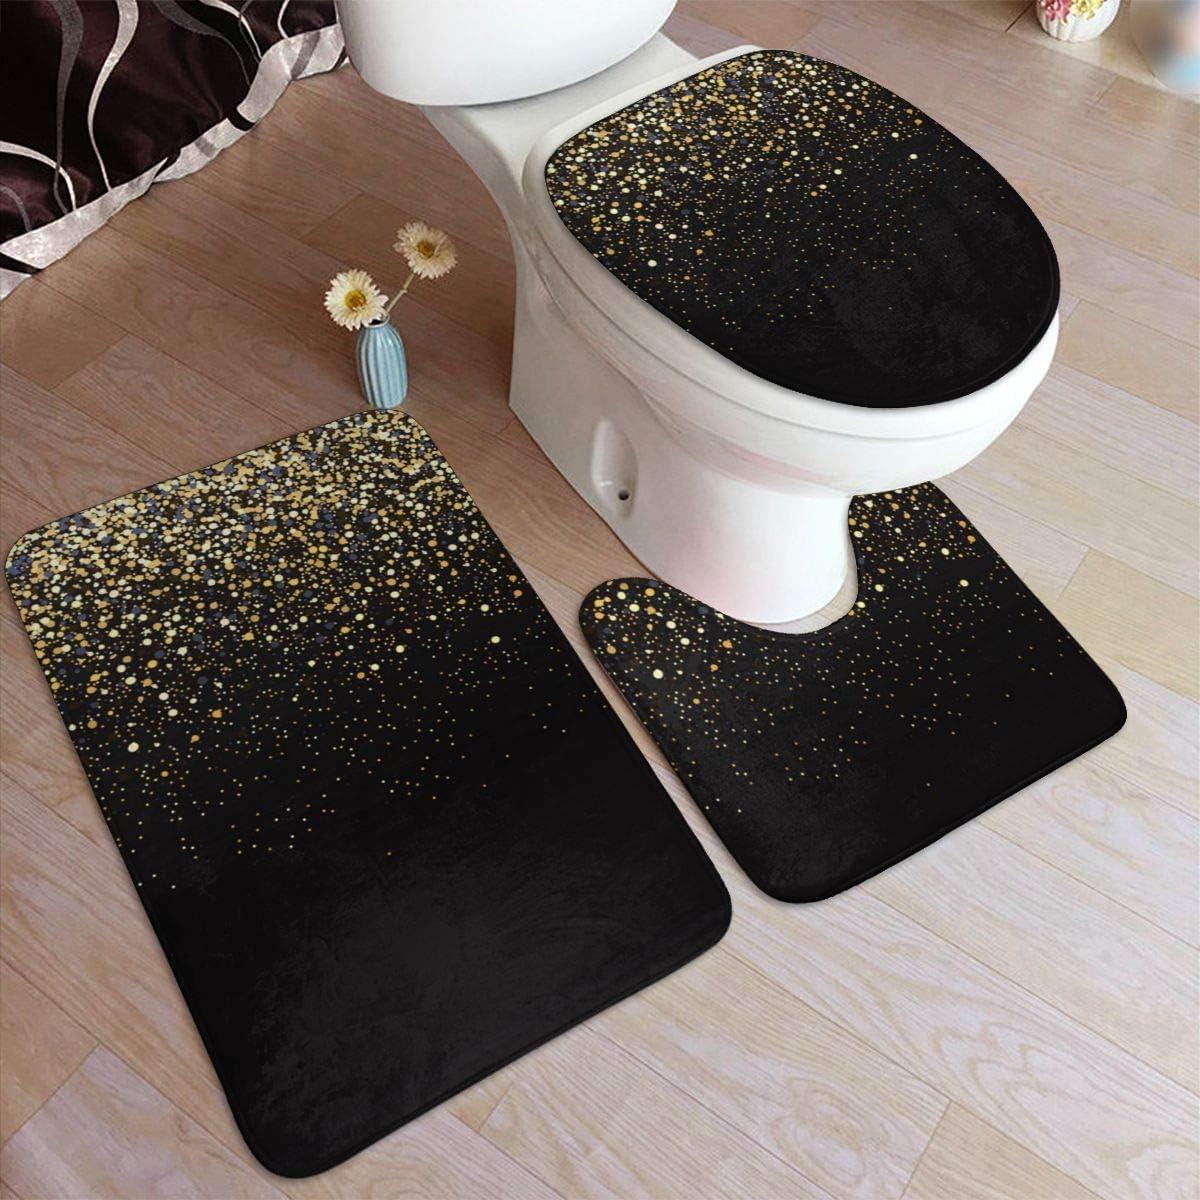 Amazon Com Vbcdgfg Bathroom Rugs Sets 3 Piece Gold Glitter Black Cool Modern Bathroom Rugs Mats Set 3 Pieces Bath Rugs For Bathroom Washable U Shaped Contour Rug Mat And Lid Cover Home